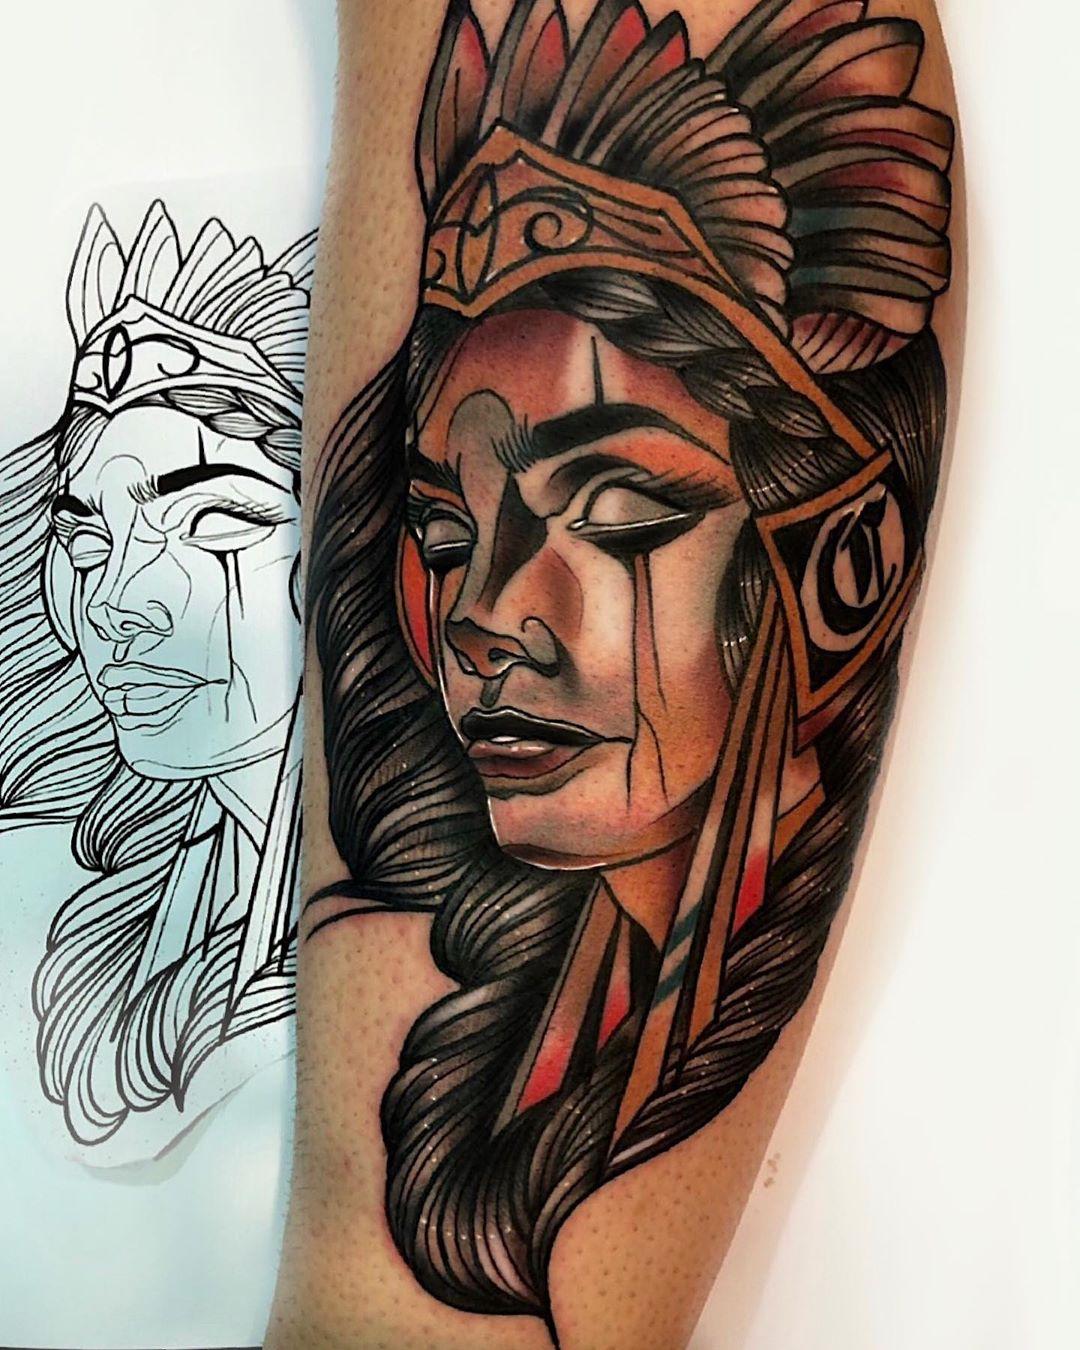 neotraditionaltattooers,followforfollow,berlin,followmeciudadreal,ciudadreal,tomelloso,almagro,puertollano,tatuajesenpuertollano,tatuajesendaimiel,ciudadrealtattoo,ciudadrealtatuajes,tatuajesciudadreal,follow,ciudadrealtatuajes,puertollano,tattooers,besttattooers,juantabasco,ciudadrealsetatua,ink,tatuajes,realismo,realistictattoo,ciudadrealtattoo,tatuajesenpuertollano,traditionaltattoos,castillalamancha,ink,tattooart,zurichtattoo,daimiel,inkedgirls,inkig,ink,inktattoos